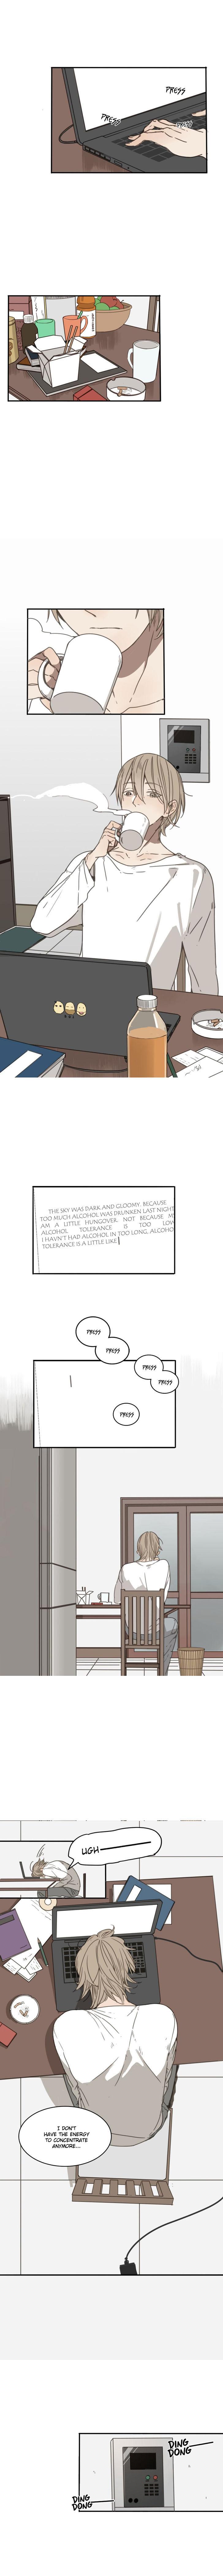 https://im.nineanime.com/comics/pic9/57/20473/426991/SilentColor150589.jpg Page 1